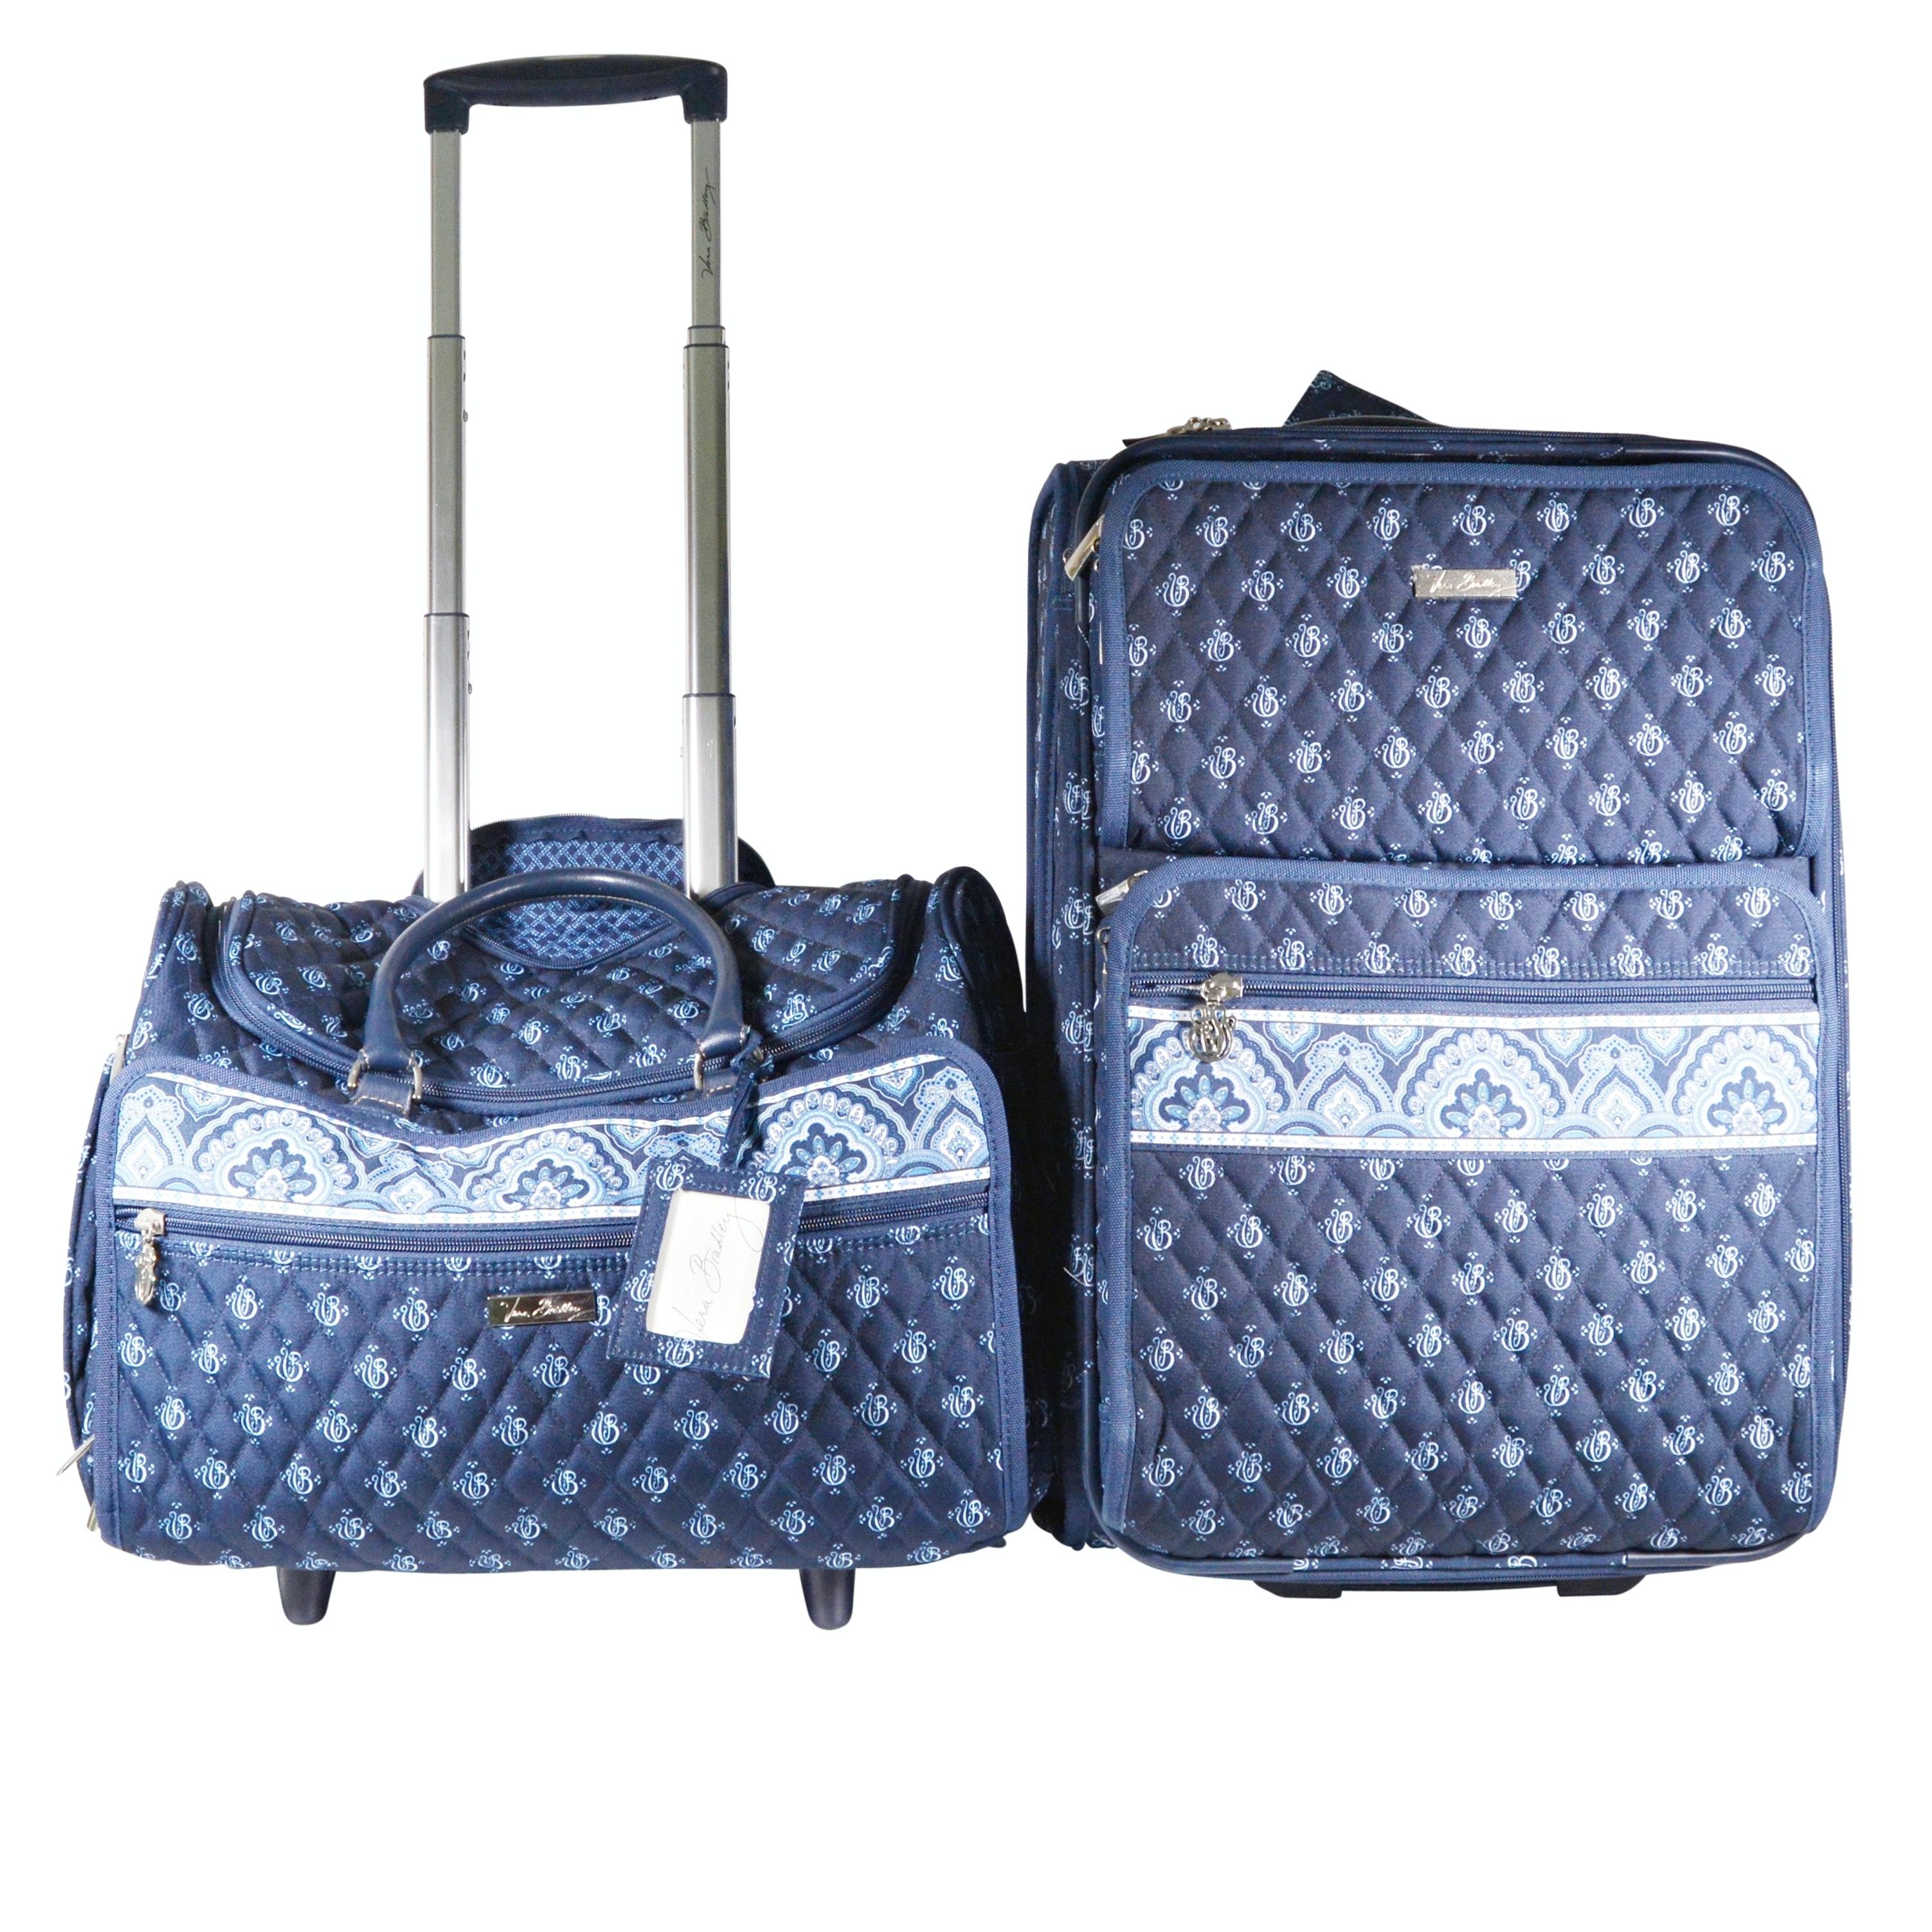 Vera Bradley Blue Fabric Luggage